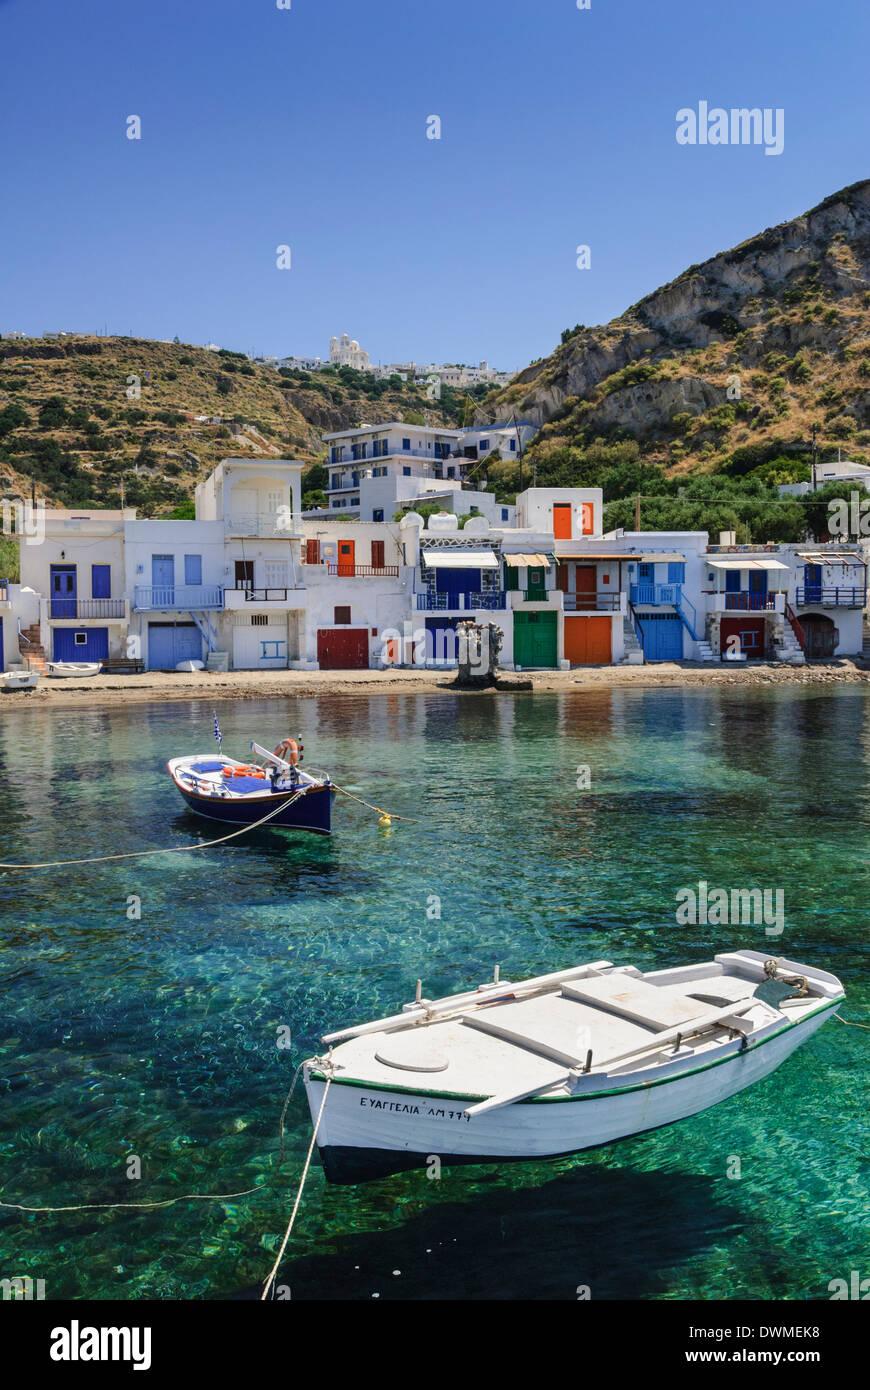 Syrmata houses in the seaside village of Klima, Milos Island, Cyclades, Greece - Stock Image